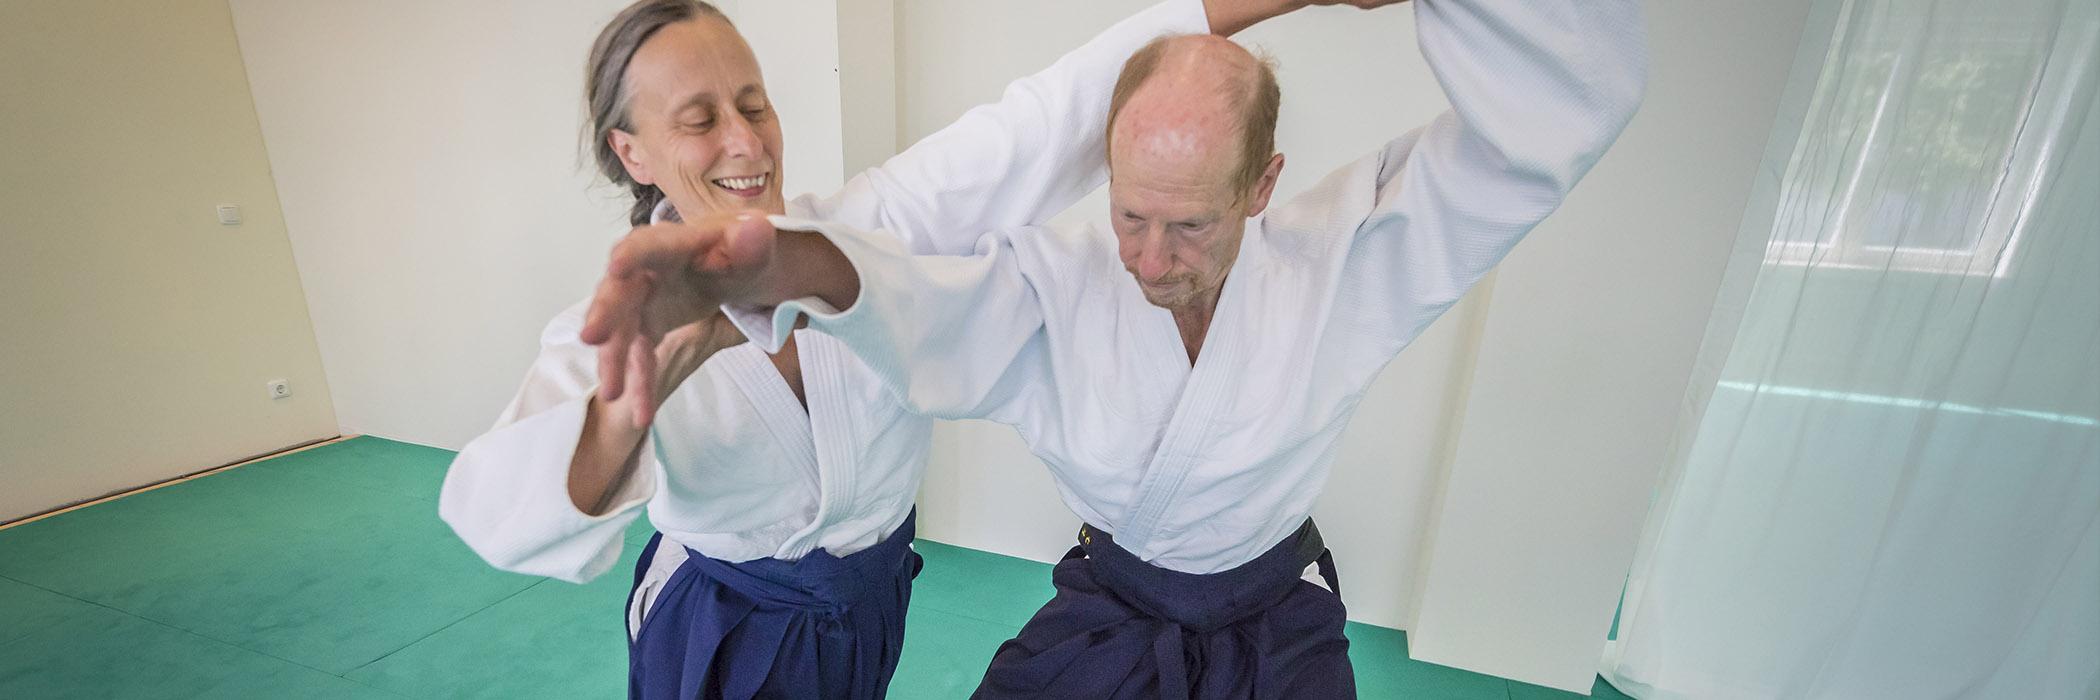 http://www.aikido-schule-bielefeld.de/wp-content/uploads/2018/12/dojoslider13.jpg